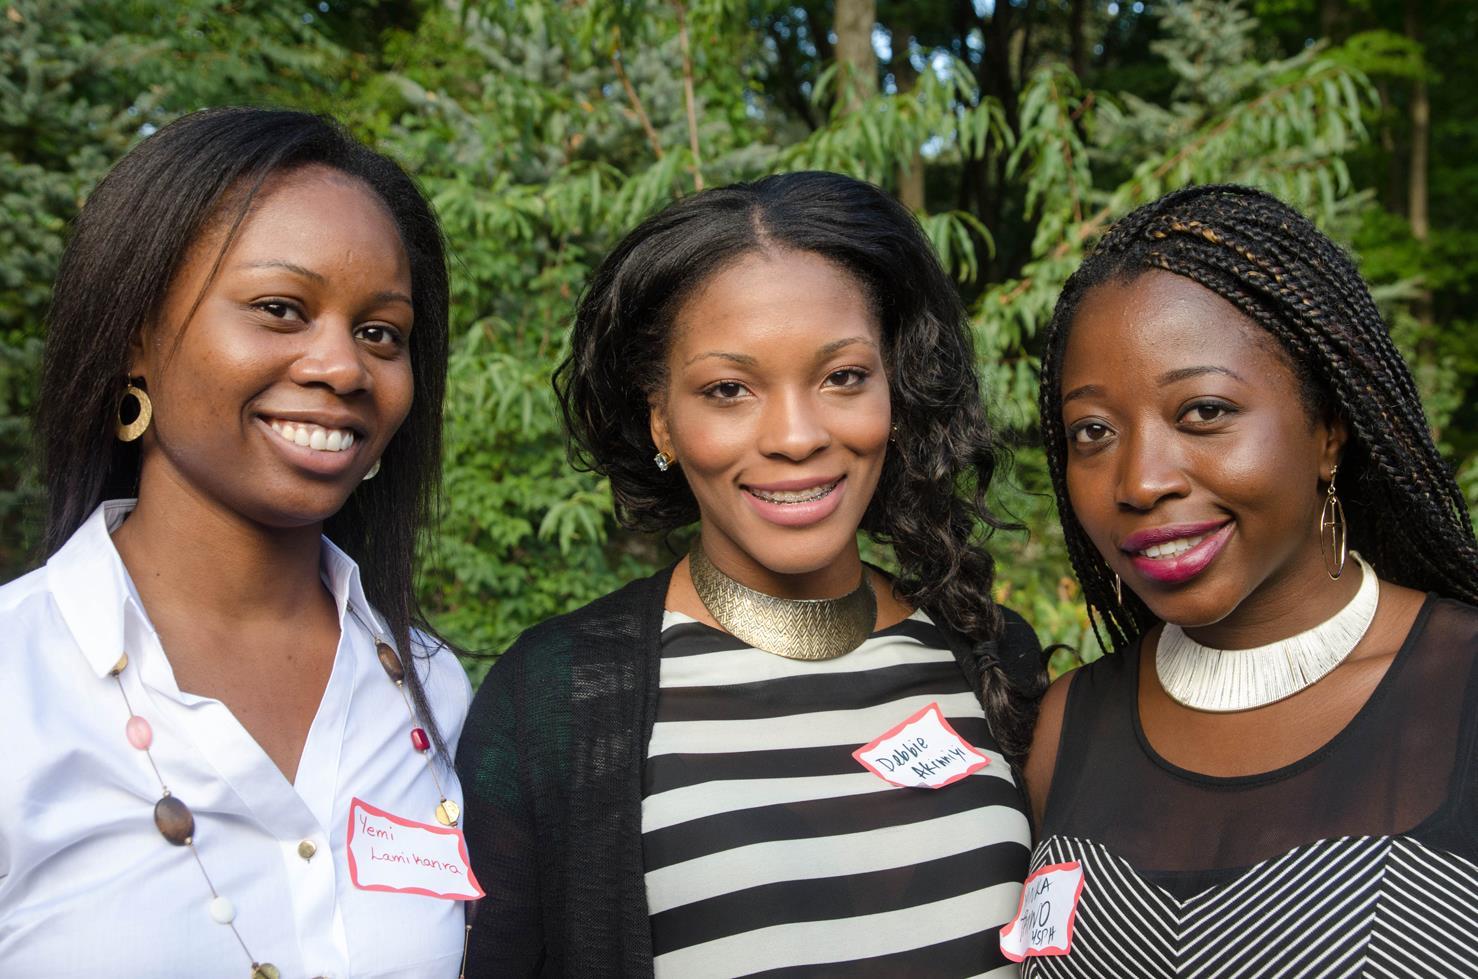 Yemi Lamikanra, a resident in orthopaedics; Deborah Akinniyi, a resident in internal medicine; and Yinka Taiwo, a student in public health.